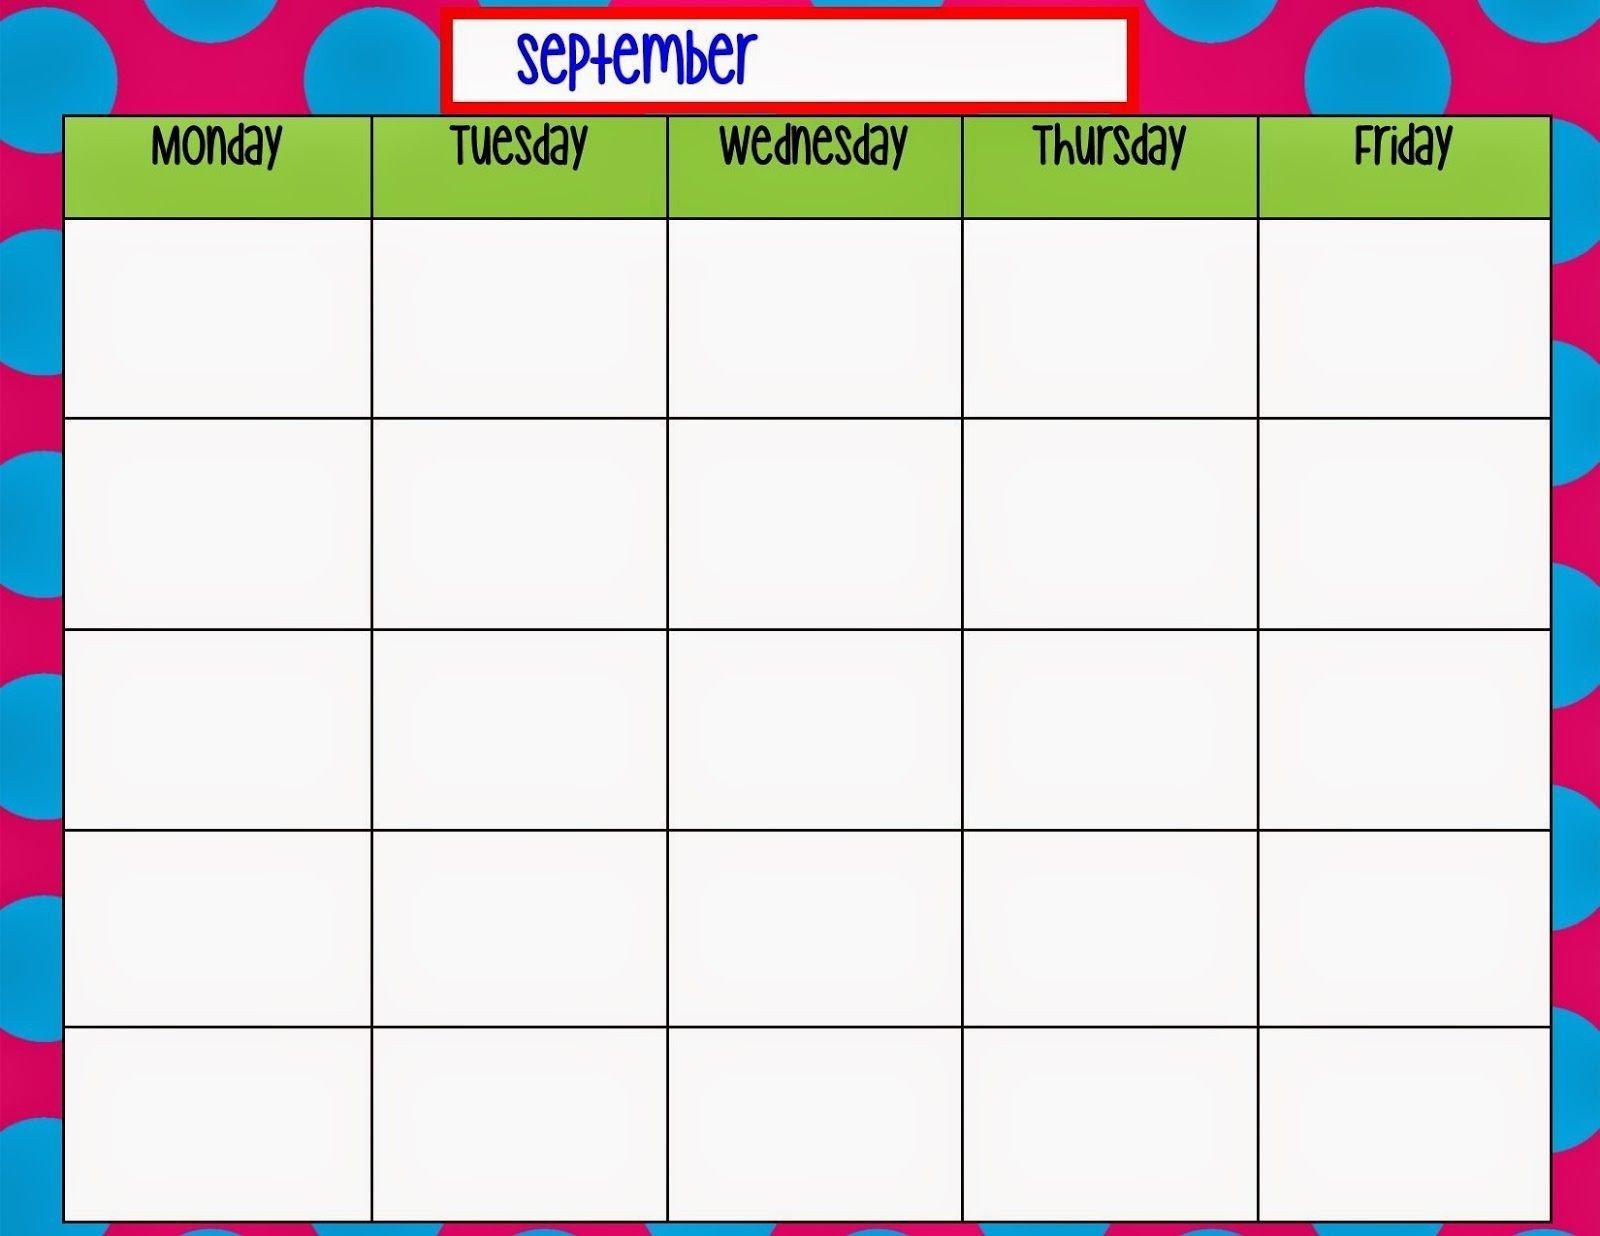 Blank Monday Through Friday Calendars   Calendar Template Free Printable Monthly Calendar Monday Thru Friday